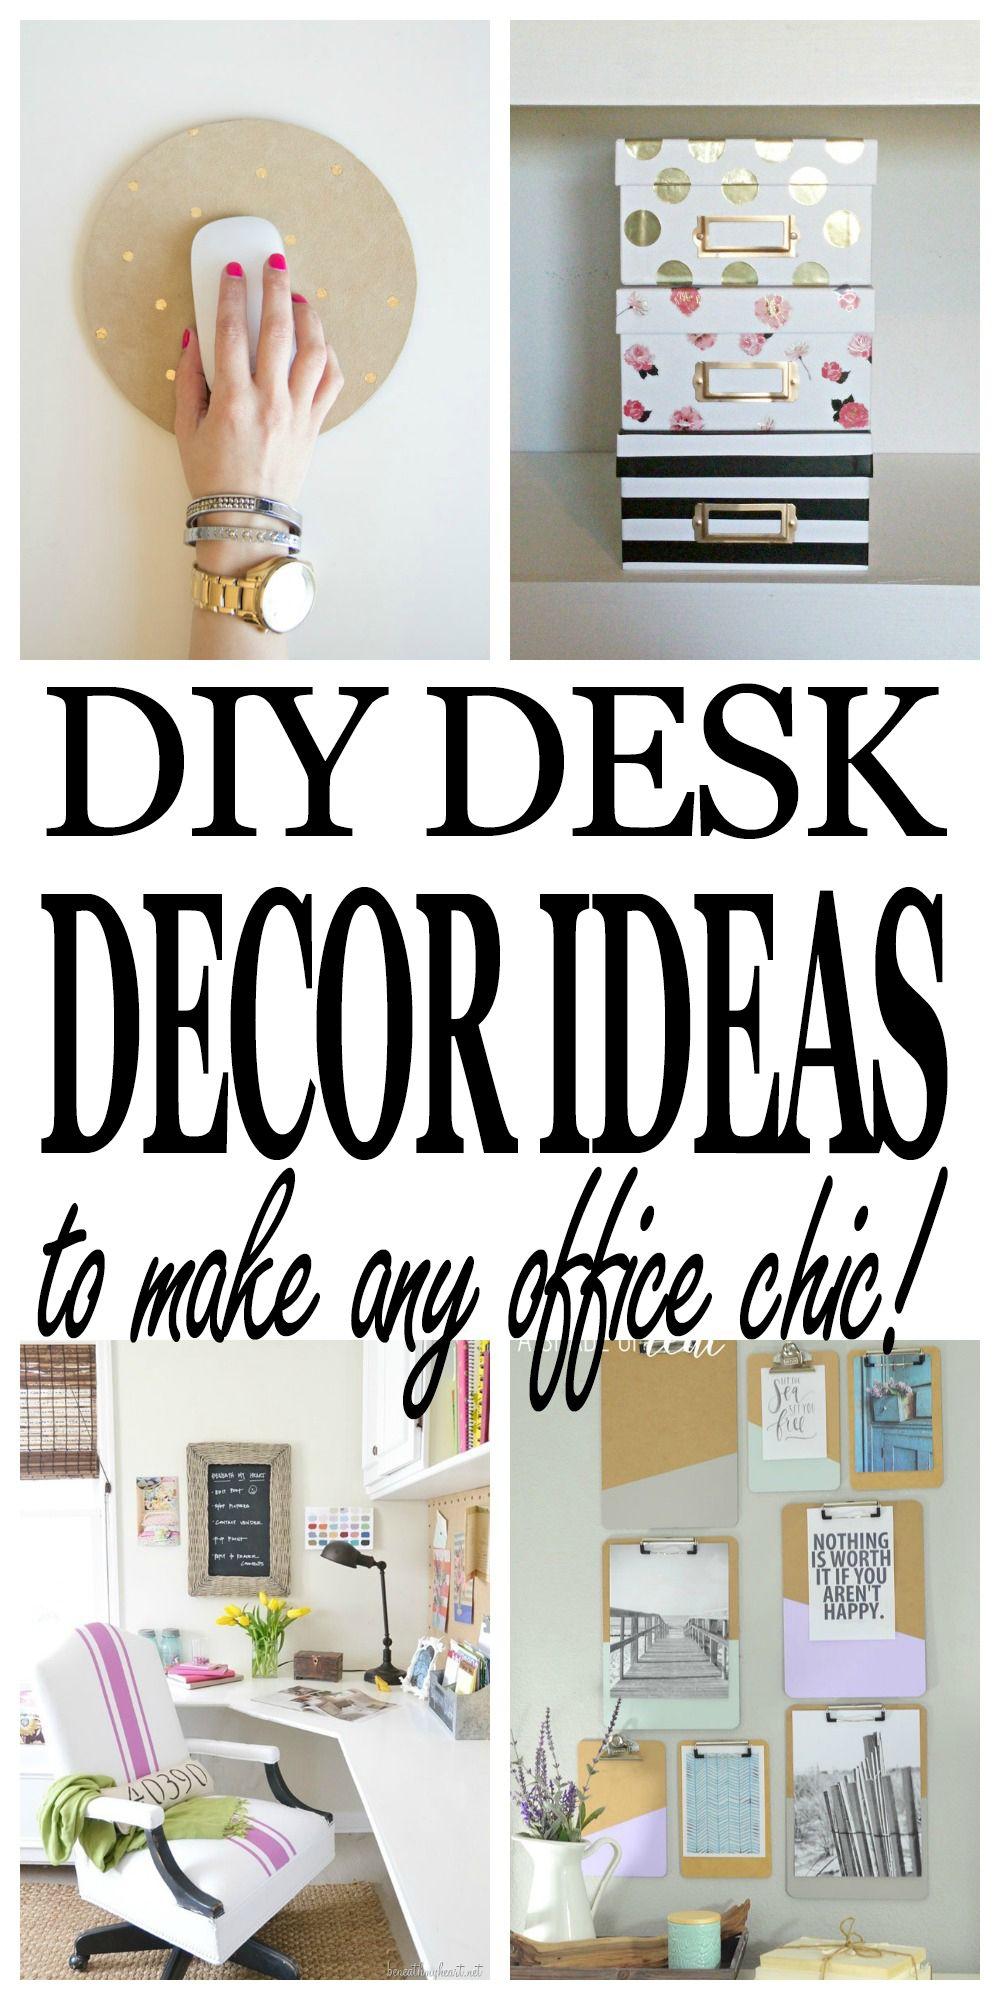 Chic Diy Desk Decor Ideas Every Office Needs Work Desk Decor Office Organization At Work Small Office Decor